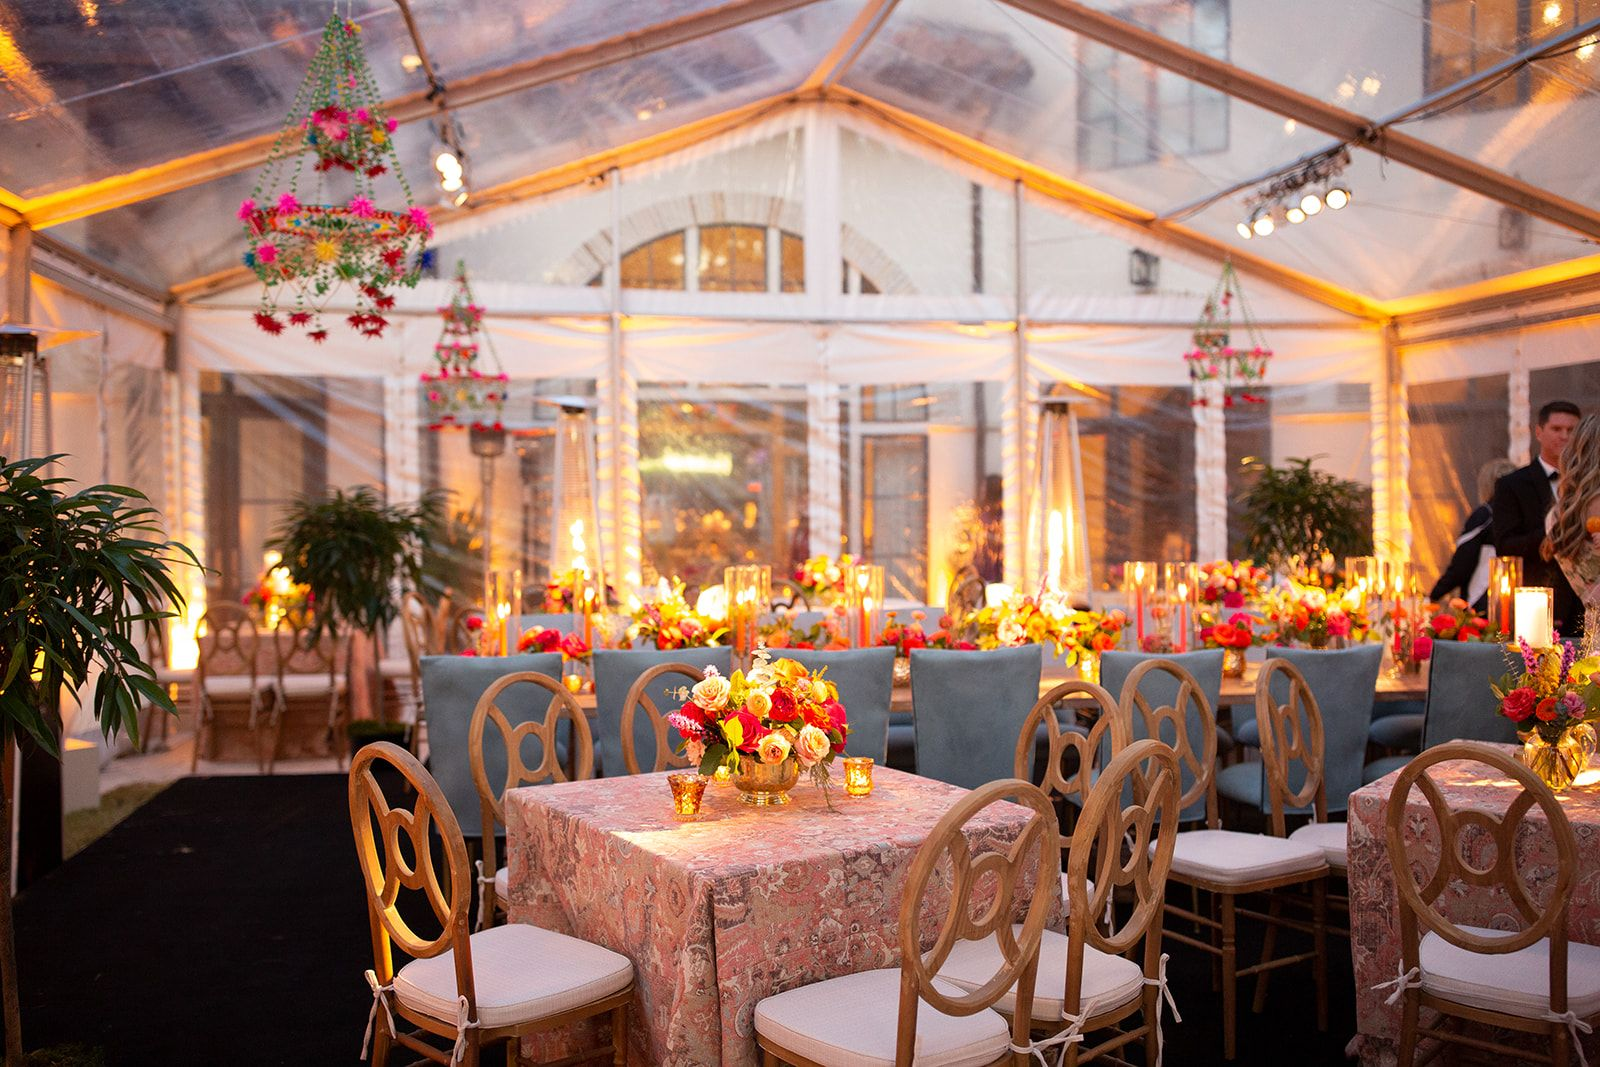 Clear tent fiesta wedding tent reception clear tent